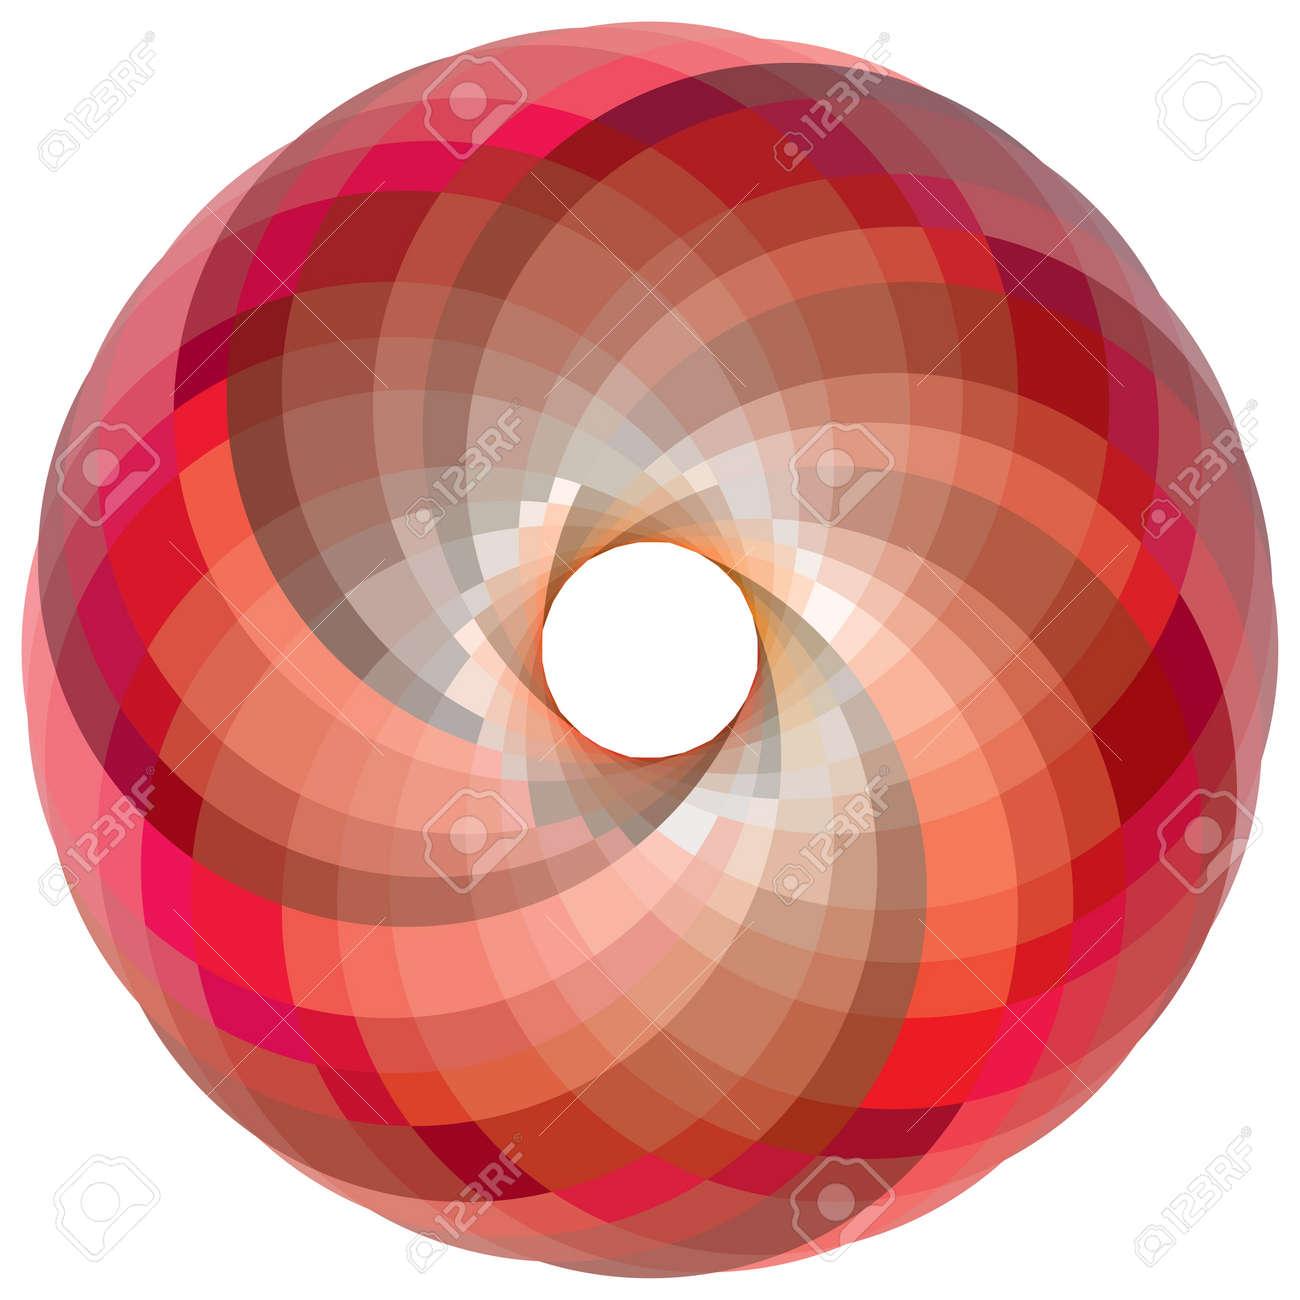 vortex color palette, abstract art illustration Stock Photo - 8545654